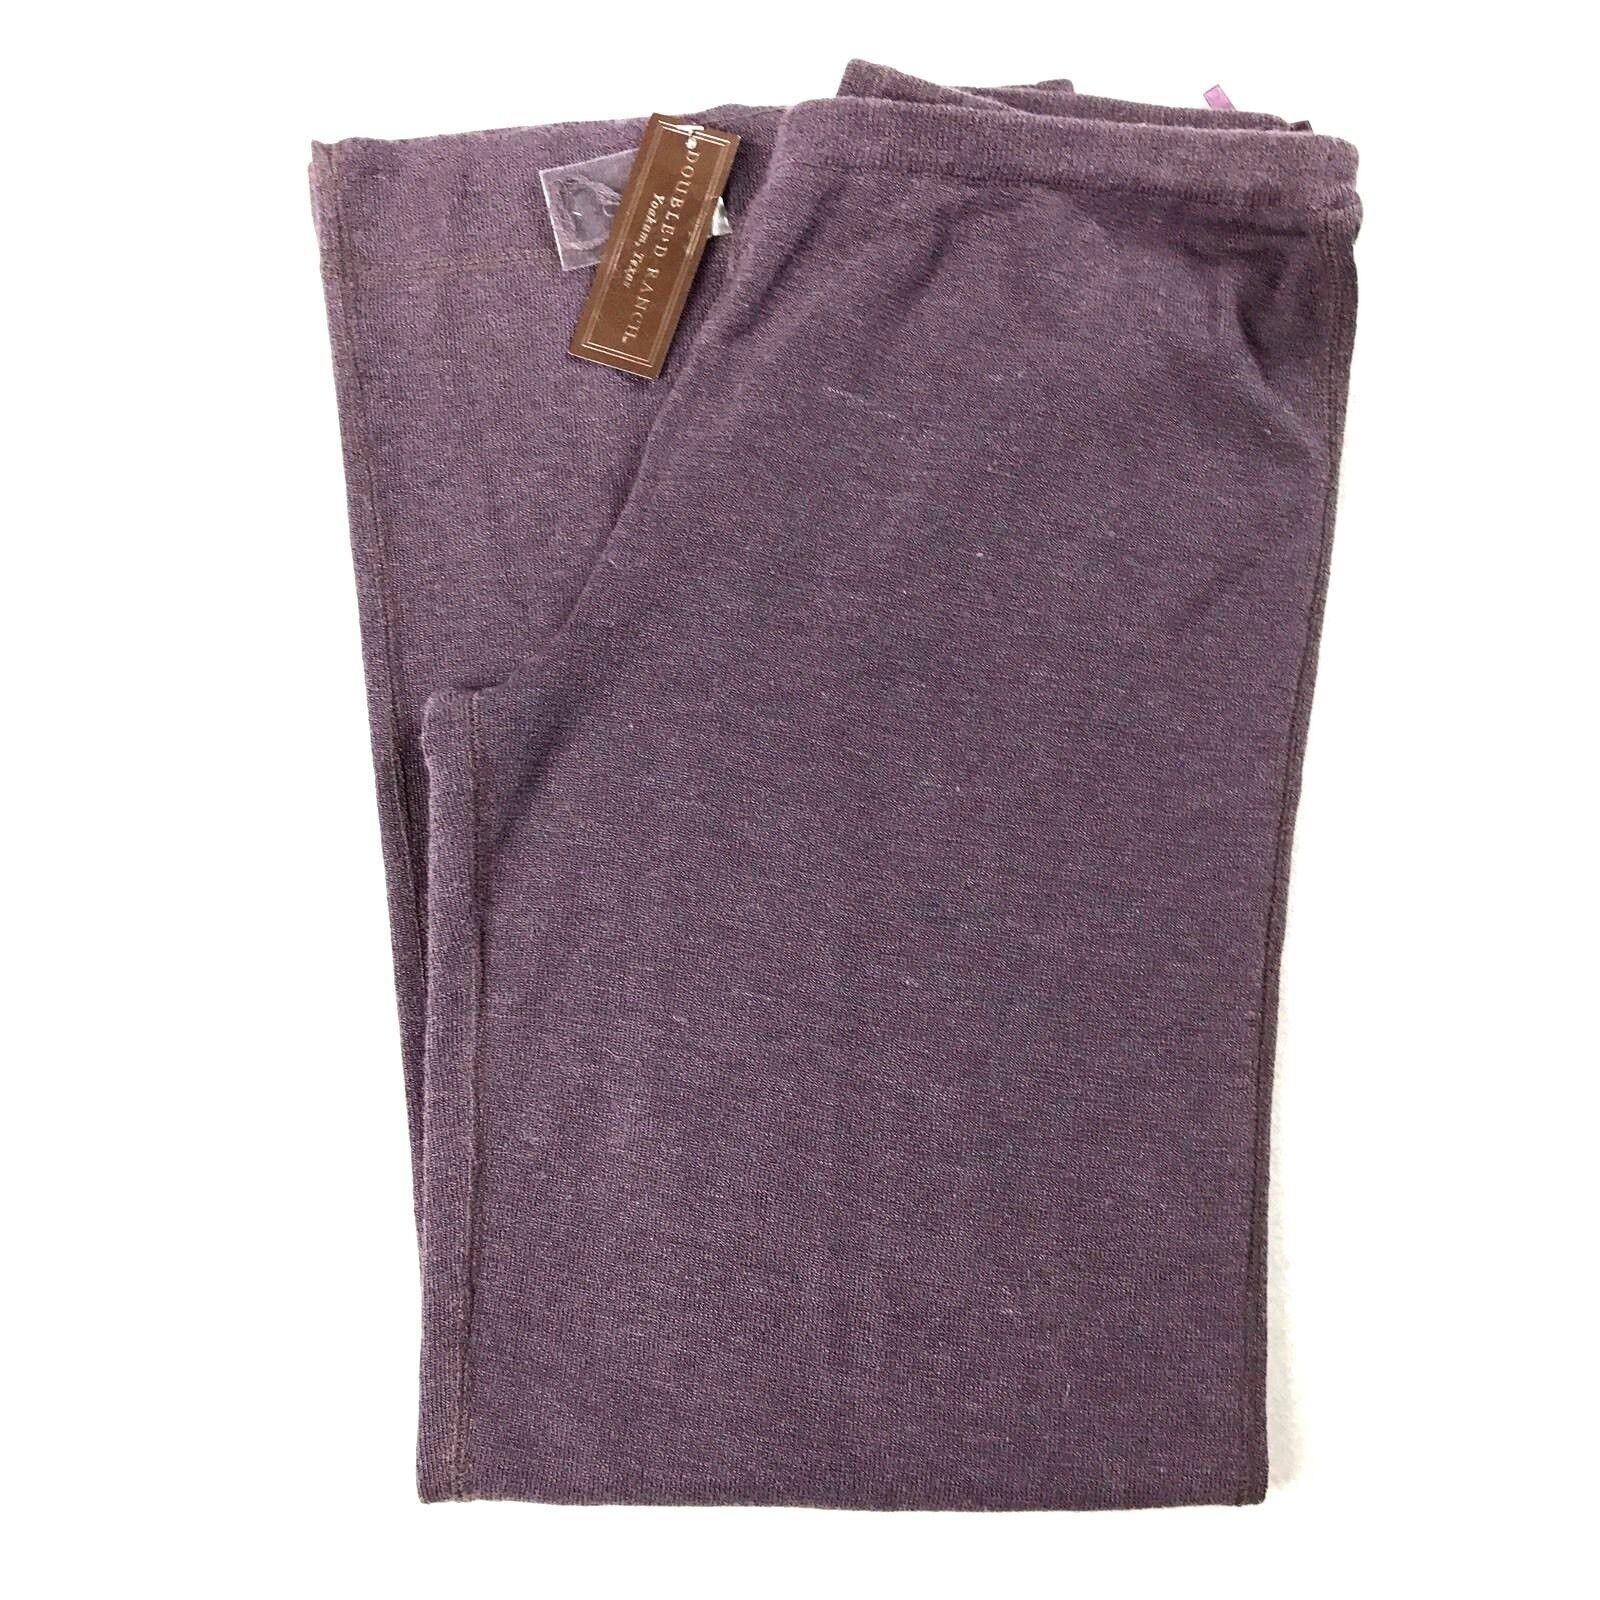 Double D Ranch Womens Pants Linen Blend Palazzo Pants Purple NWT Large